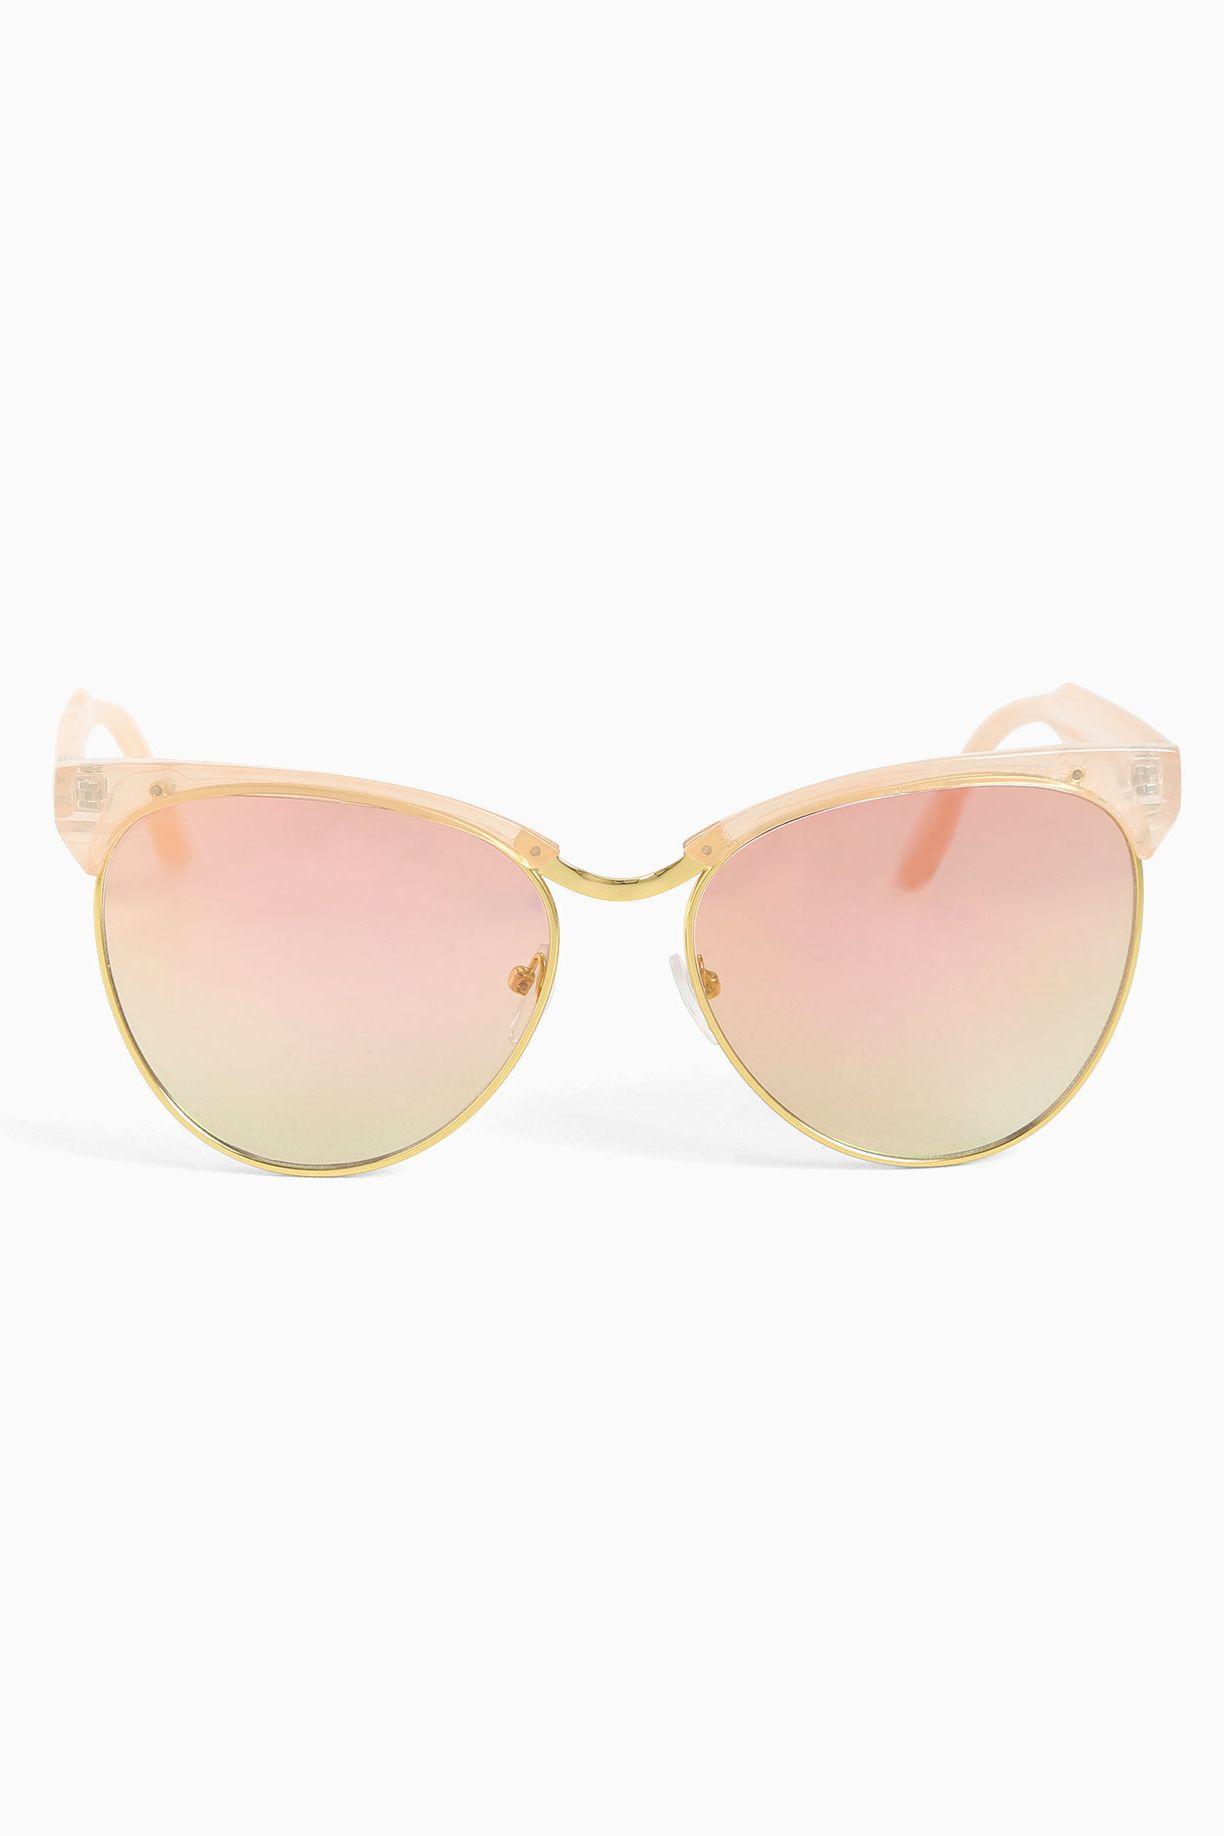 89f24c76391 Pink Framed Mirror Sunglasses - Mirror Decorating Ideas